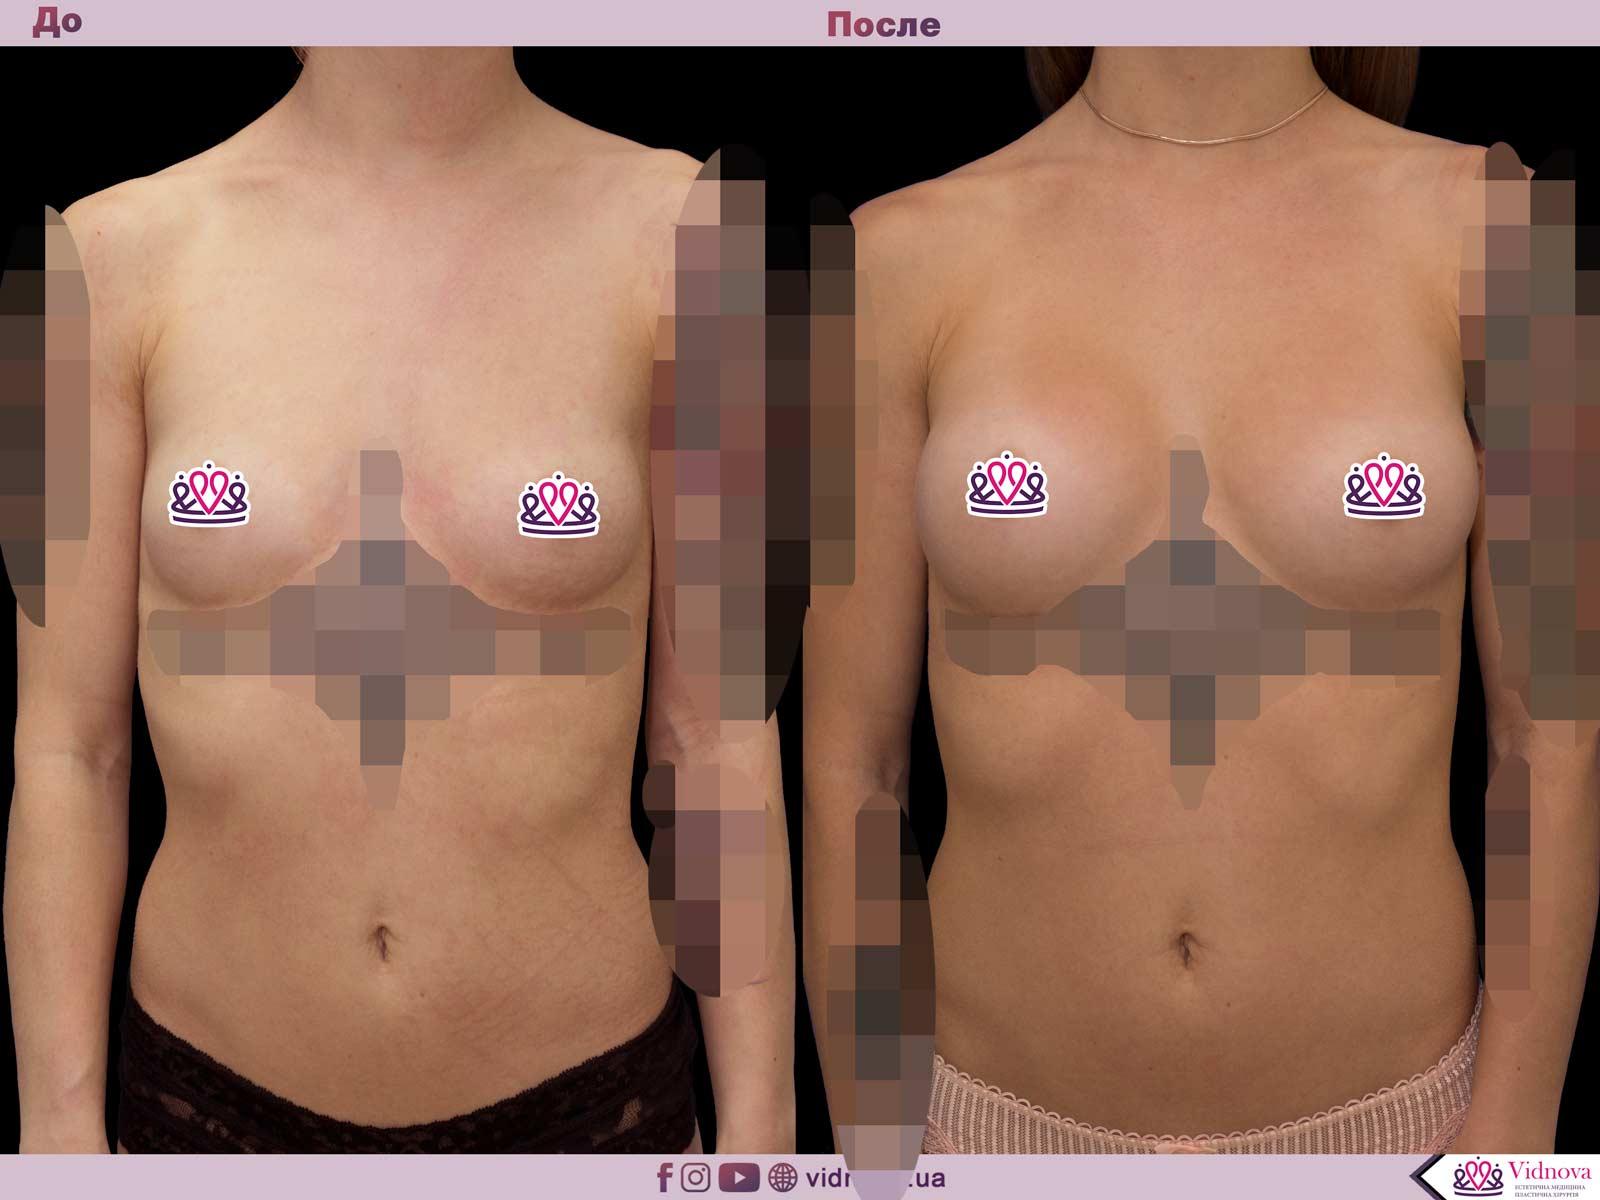 Увеличение груди: Фото ДО и ПОСЛЕ - Пример №37-1 - Клиника Vidnova